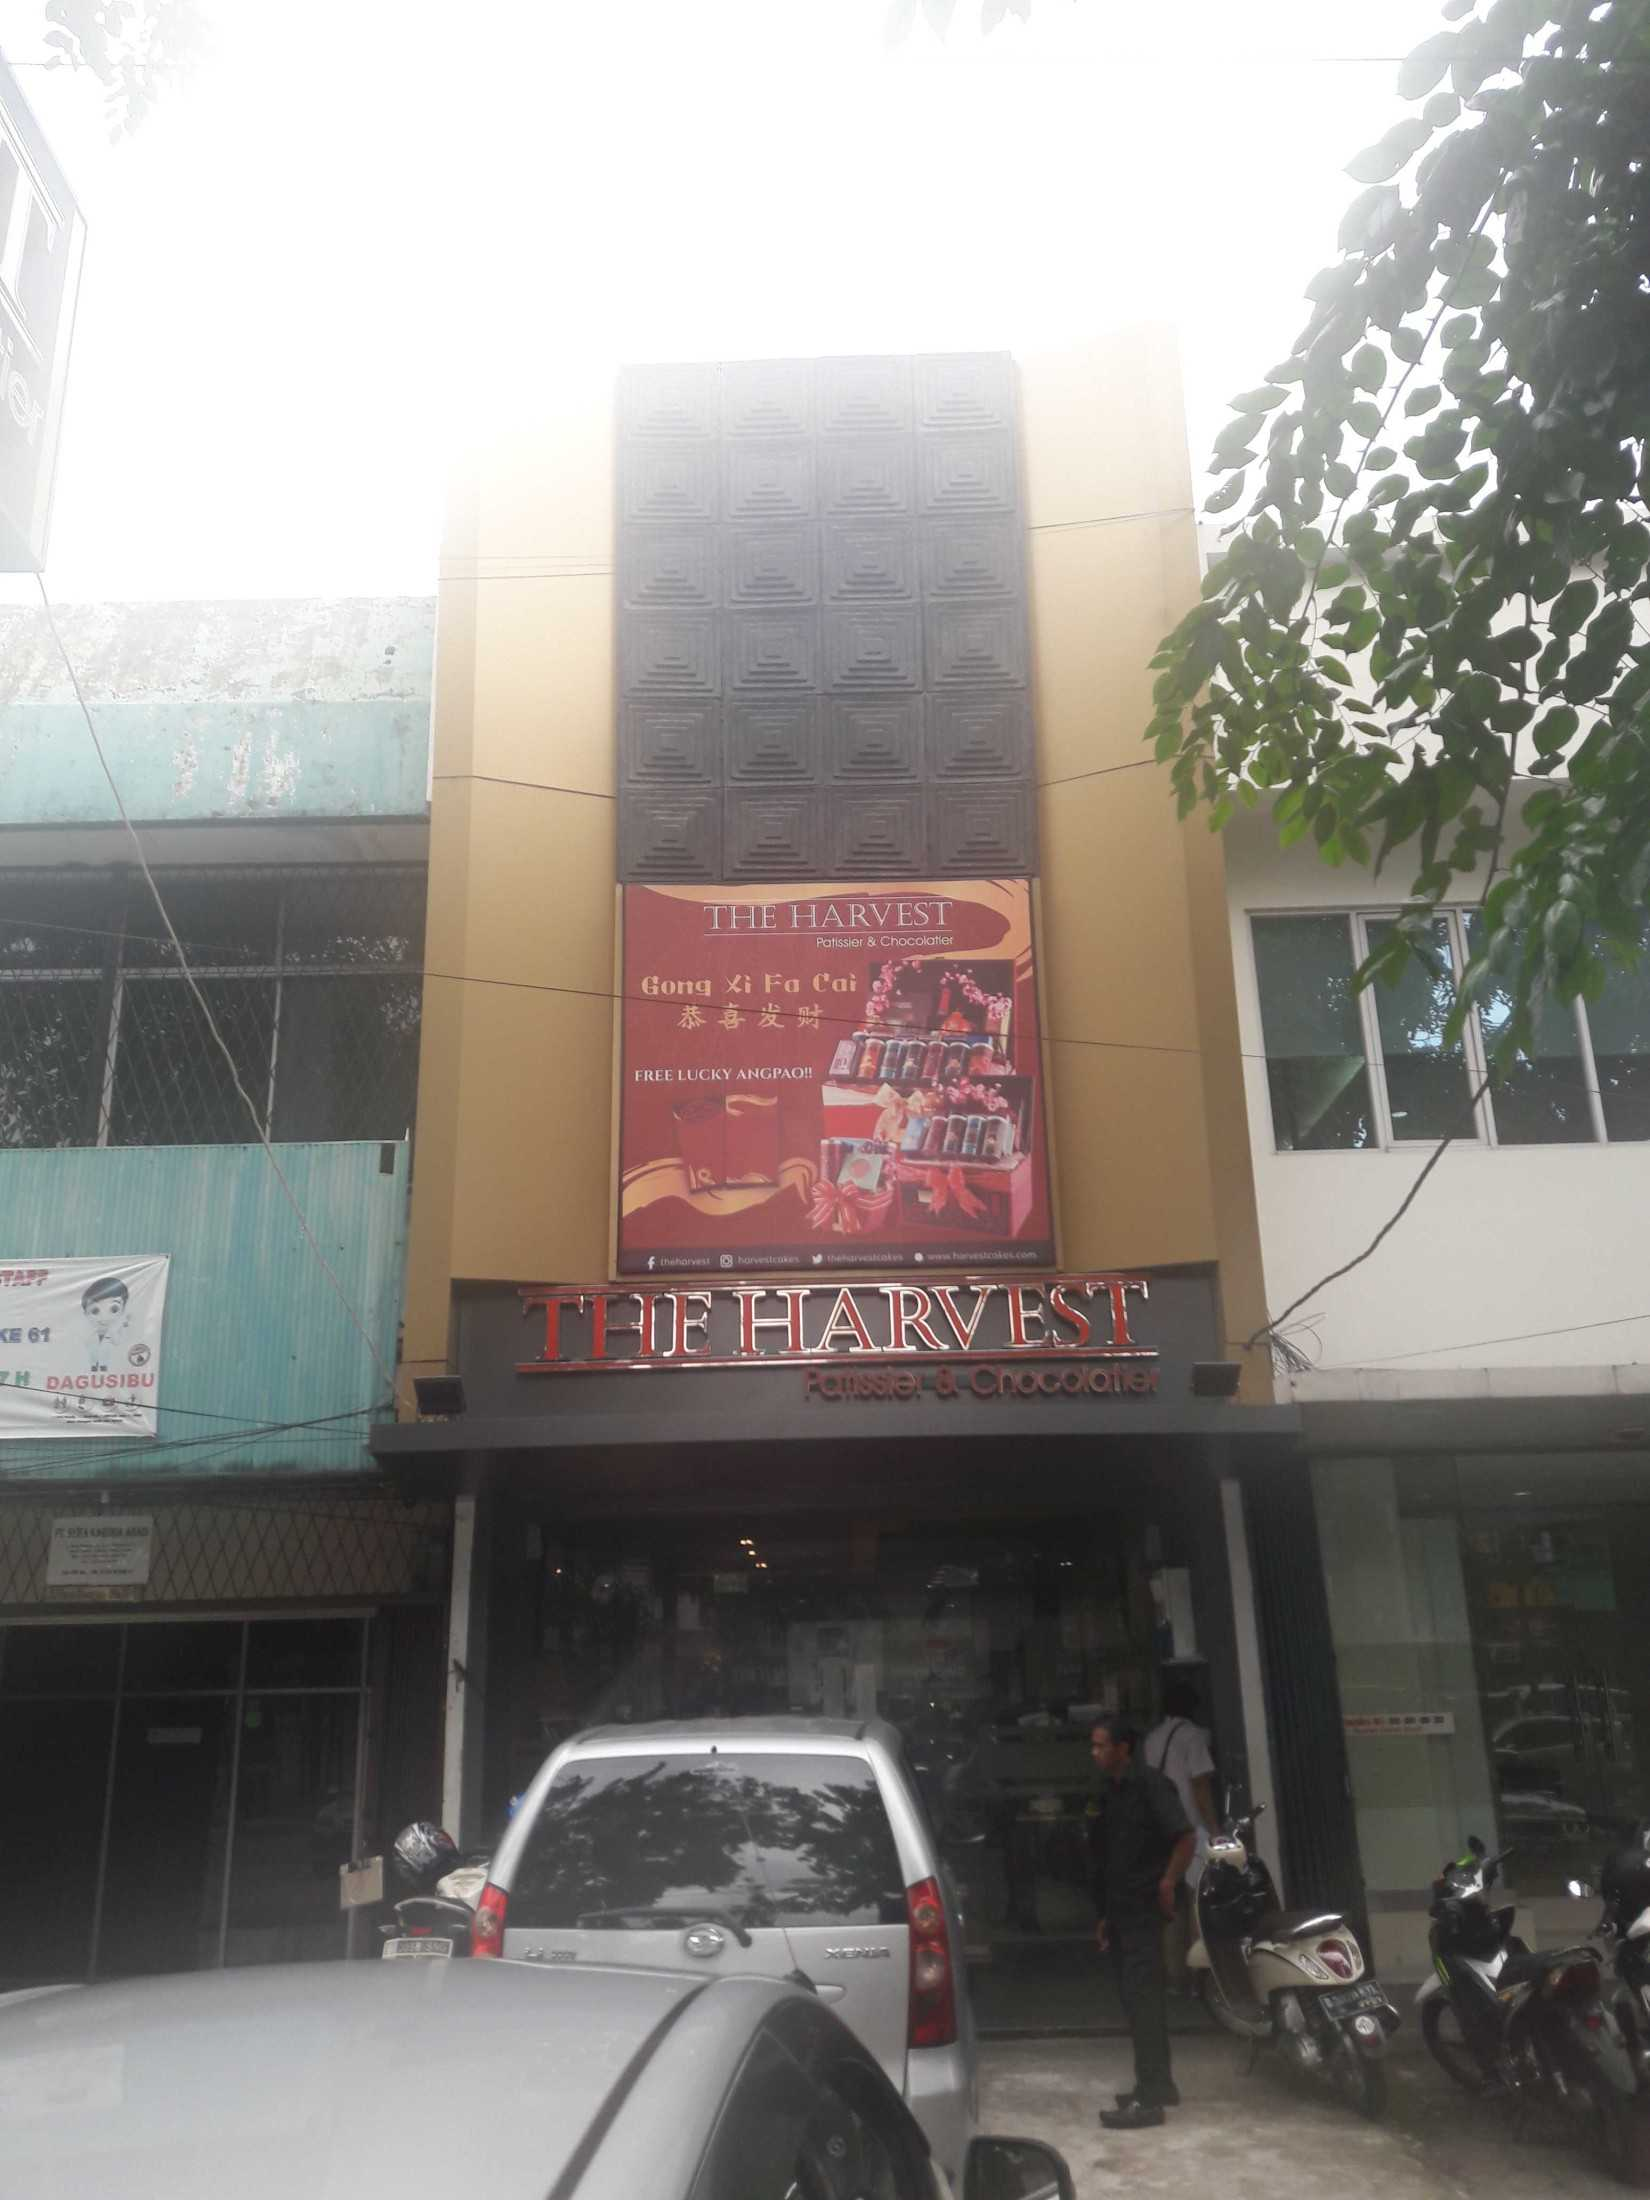 Drajat Food And Baverage Jakarta Utara, Kota Jkt Utara, Daerah Khusus Ibukota Jakarta, Indonesia Jakarta Utara, Kota Jkt Utara, Daerah Khusus Ibukota Jakarta, Indonesia Drajat-Food-And-Baverage  76139